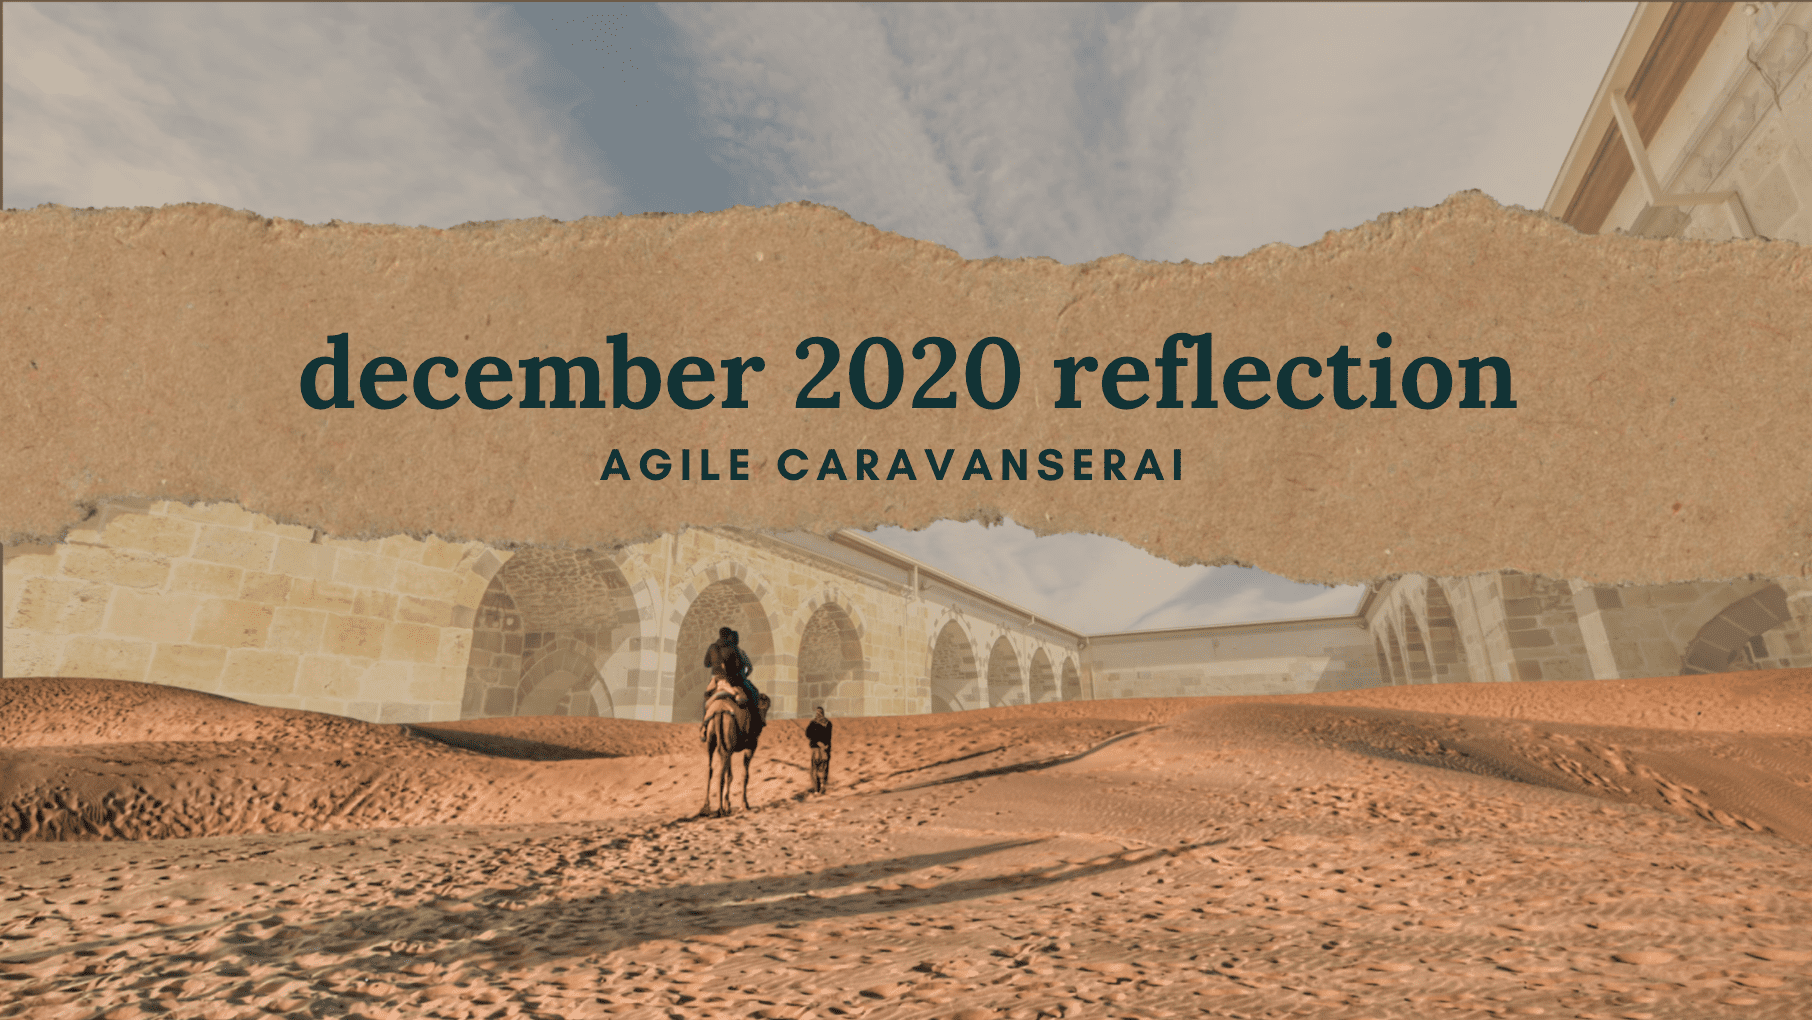 Agile Caravanserai: December 2020 Reflection